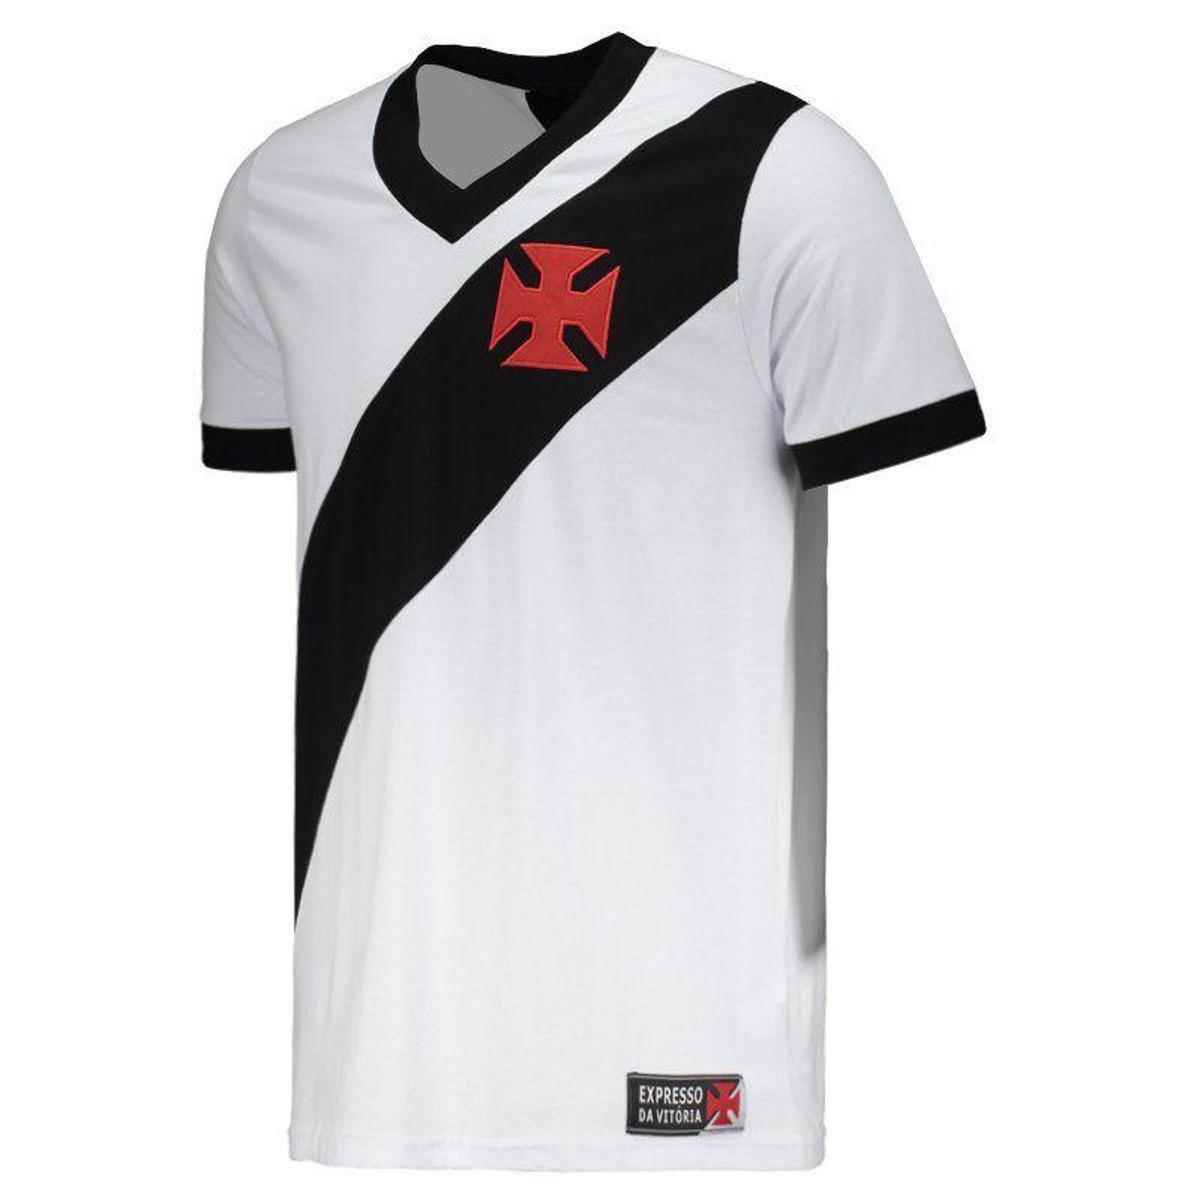 Camiseta Vasco Expresso Masculina  Camiseta Vasco Expresso Masculina ... 9b96d8622b375